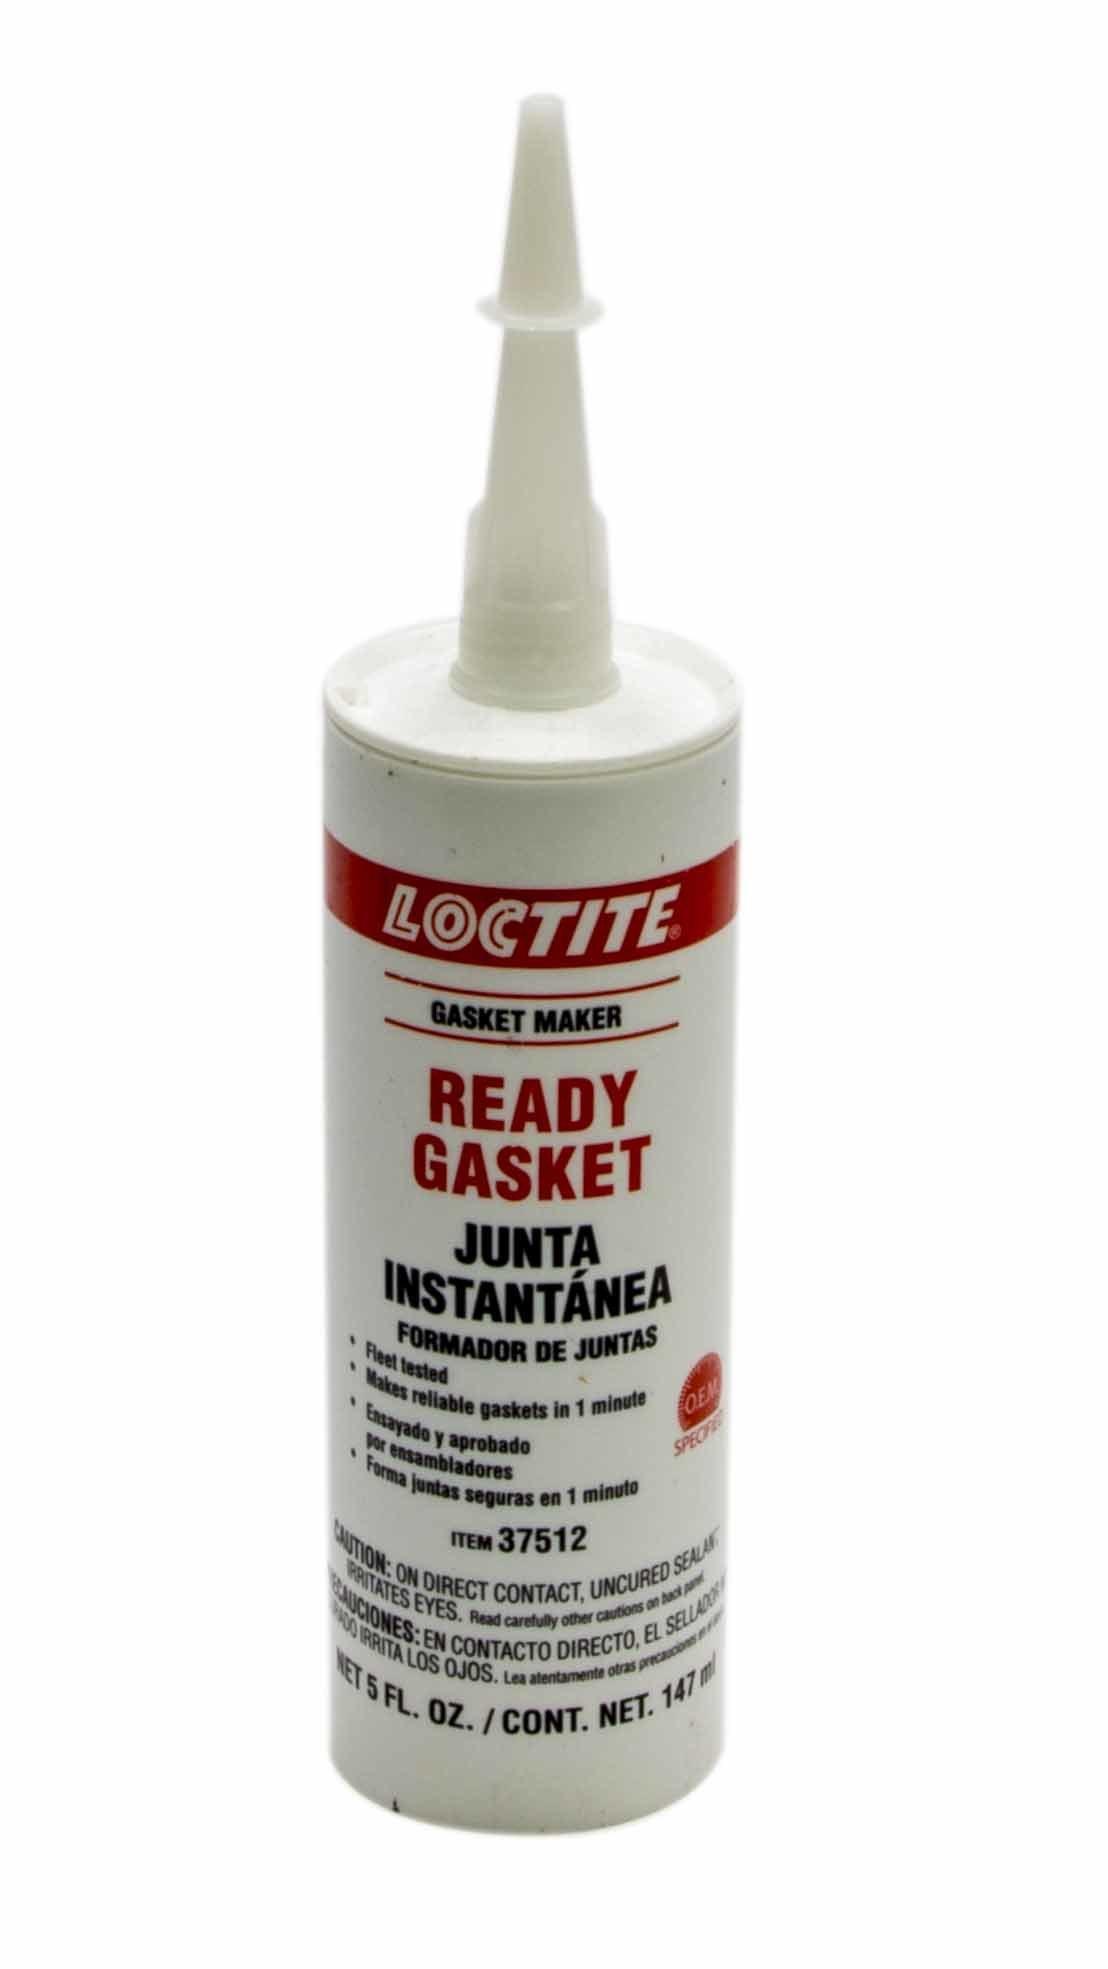 Loctite 494150 Sealant, Black Gasket Maker, Silicone, 5 oz Cartridge, Each